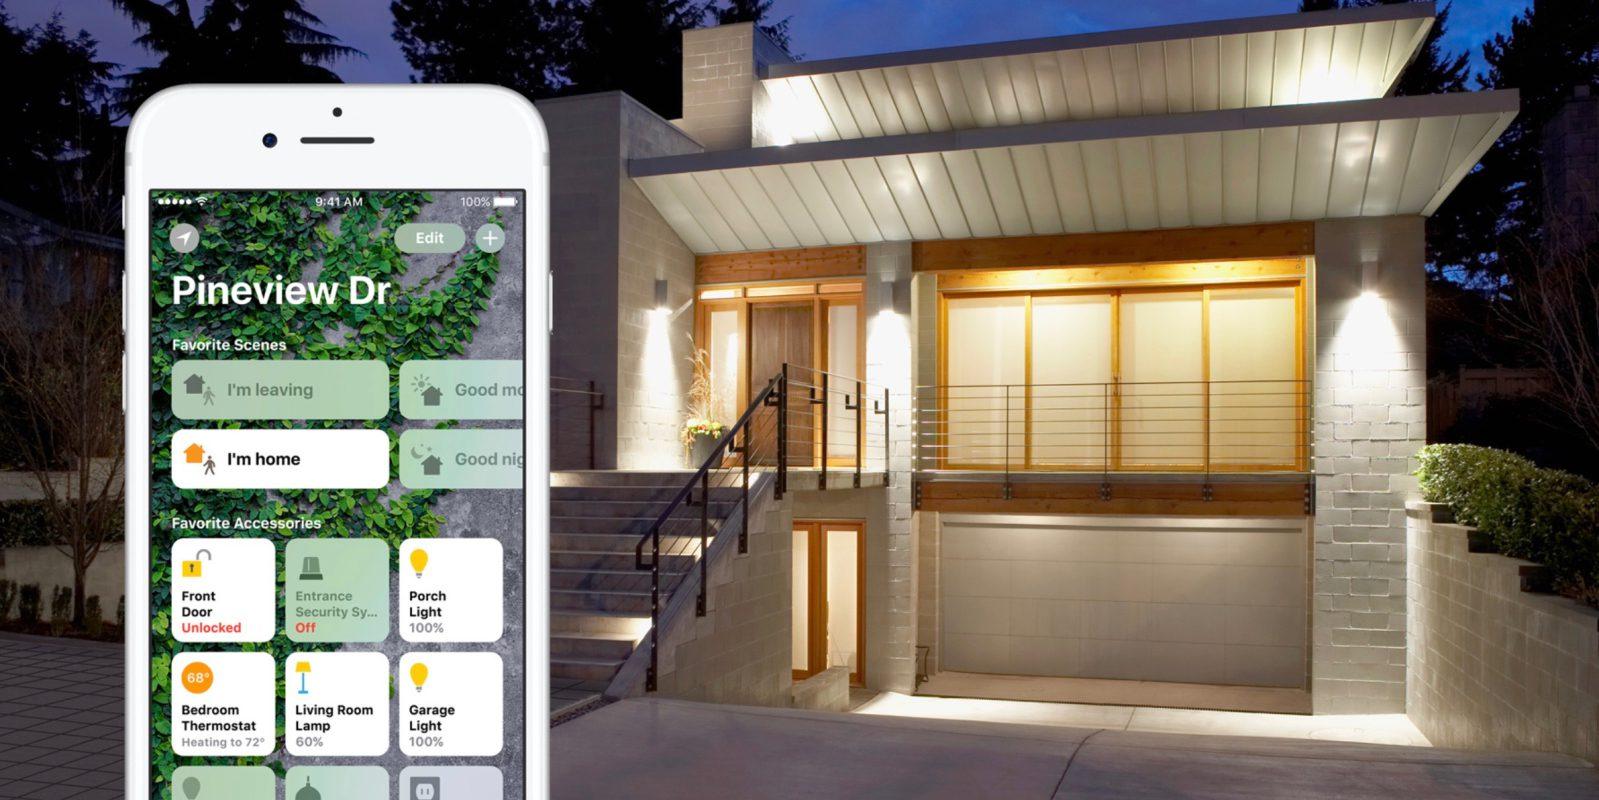 How to: Build a HomeKit or Alexa-powered smart home on a $200 budget